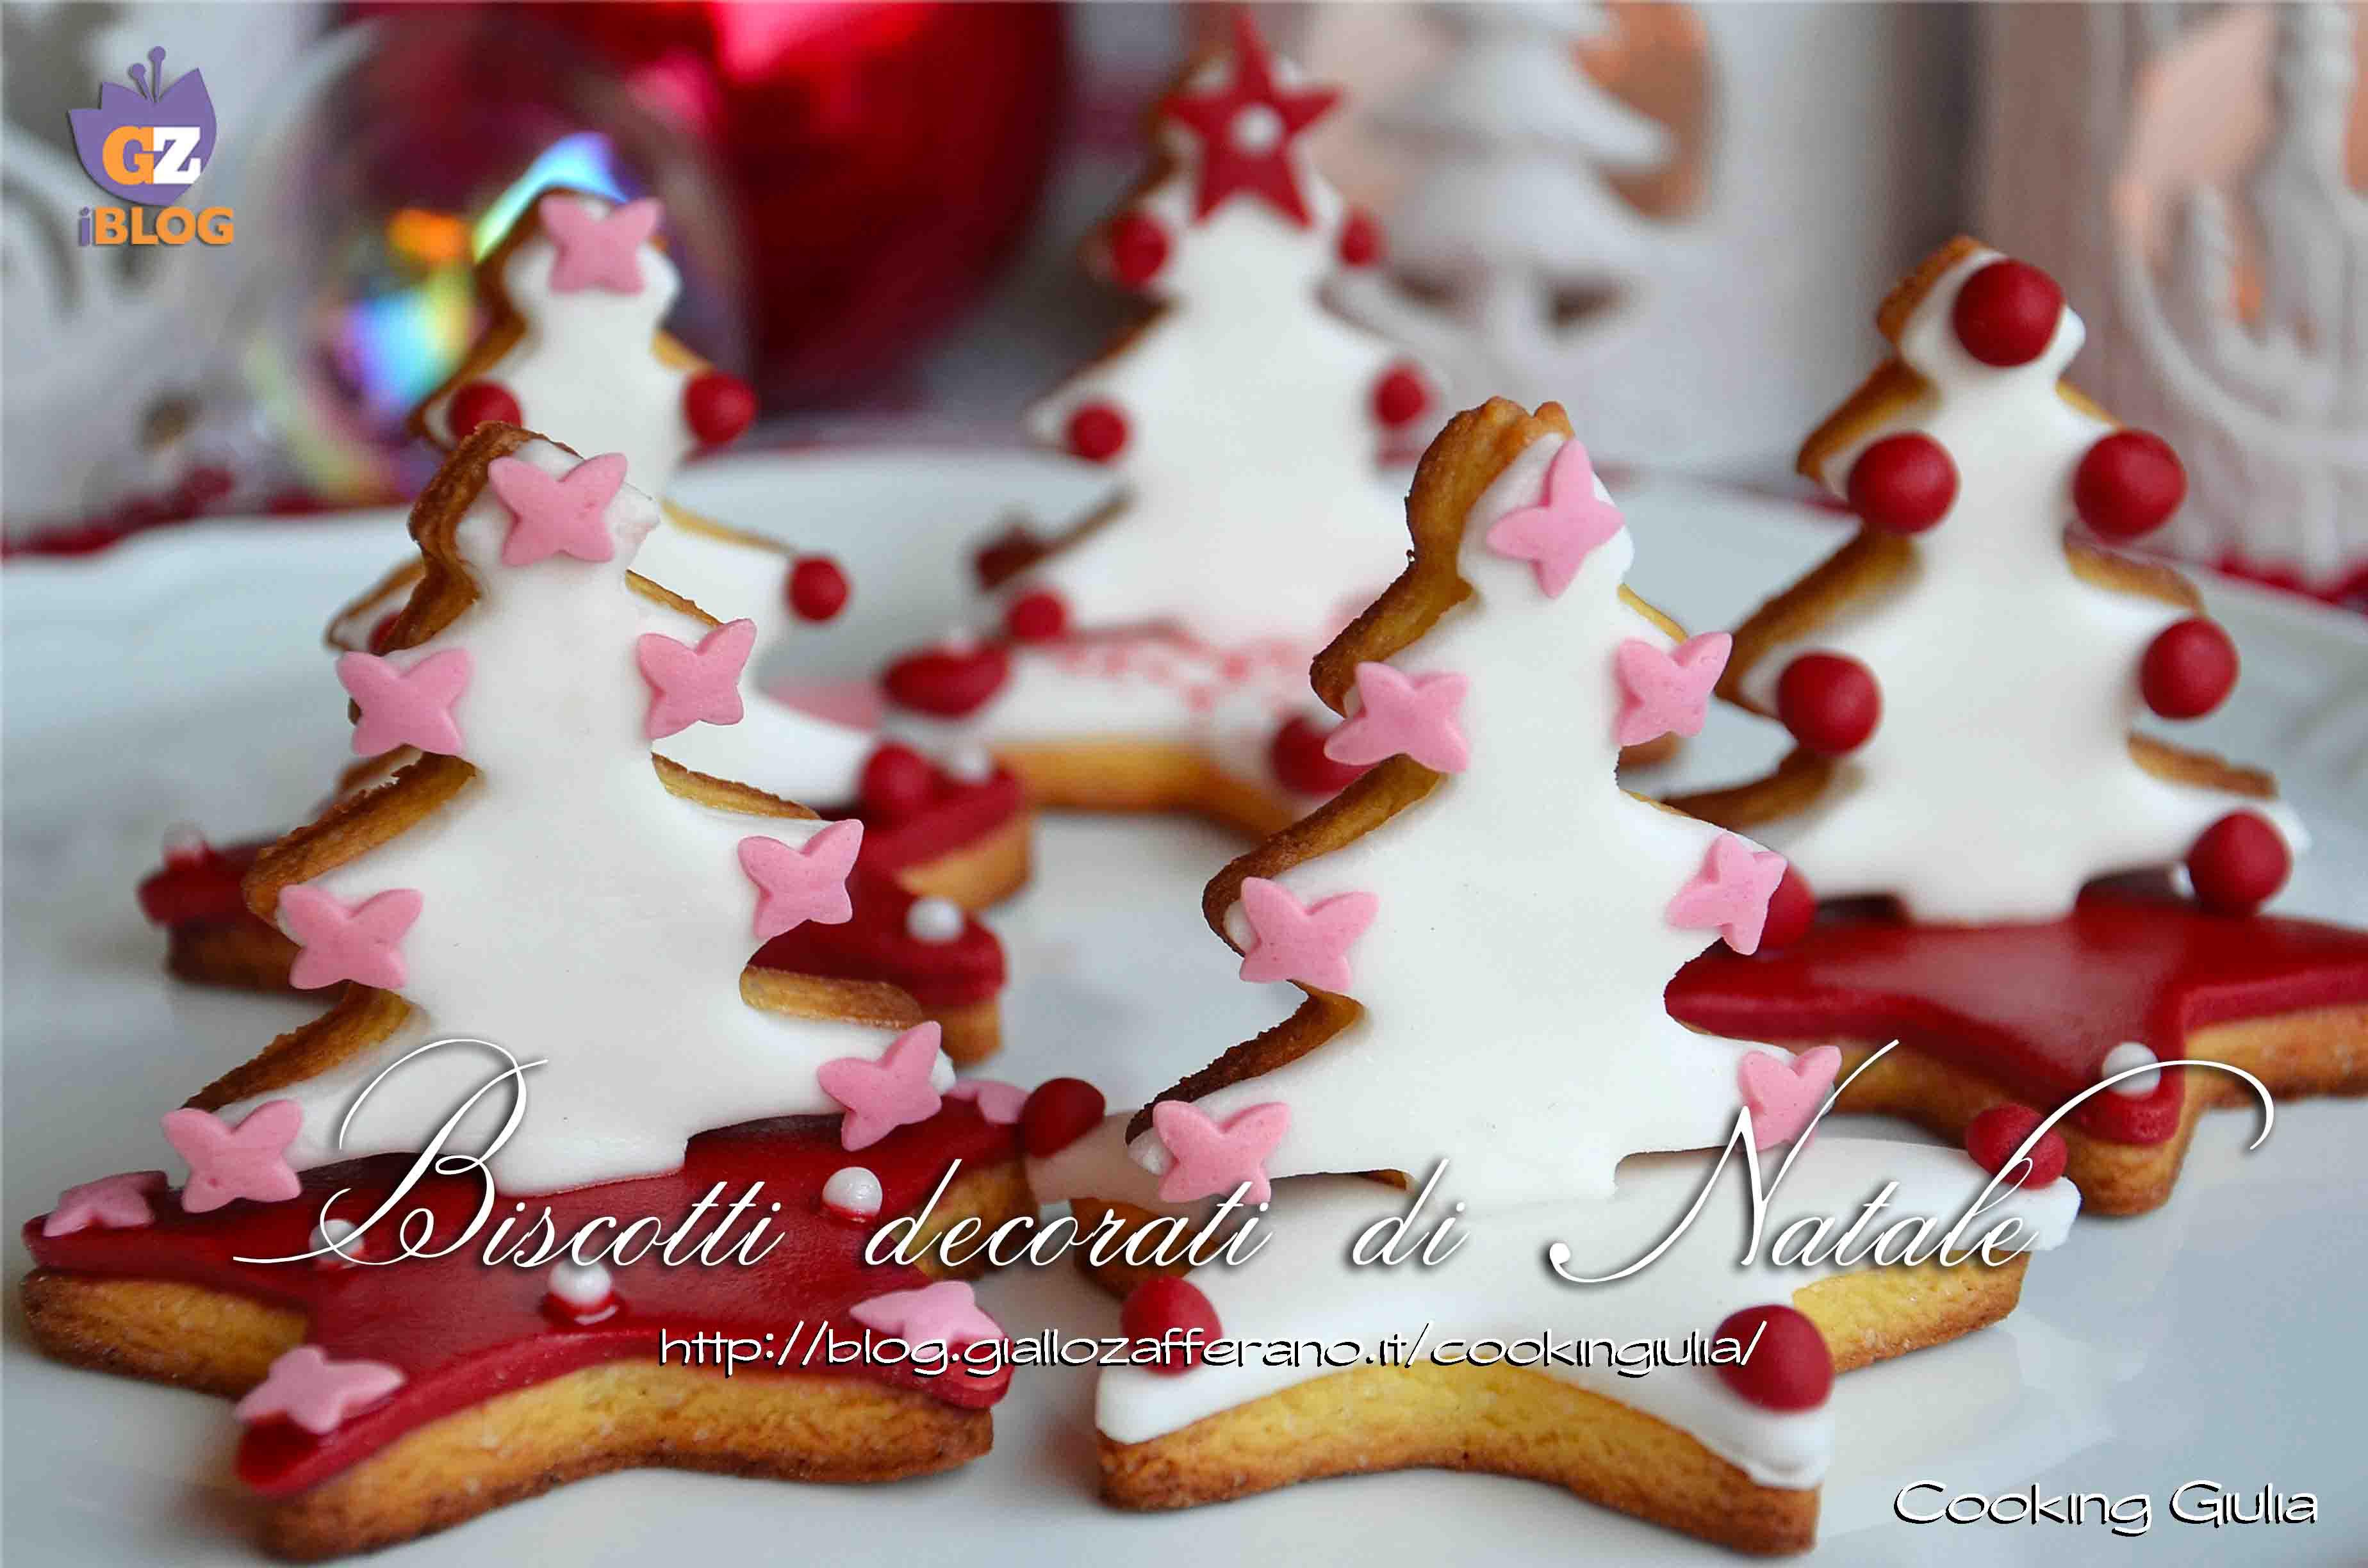 Segnaposto Natalizi Pasta Di Zucchero.Biscotti Decorati Di Natale Pasta Di Zucchero Segnaposto Natalizi